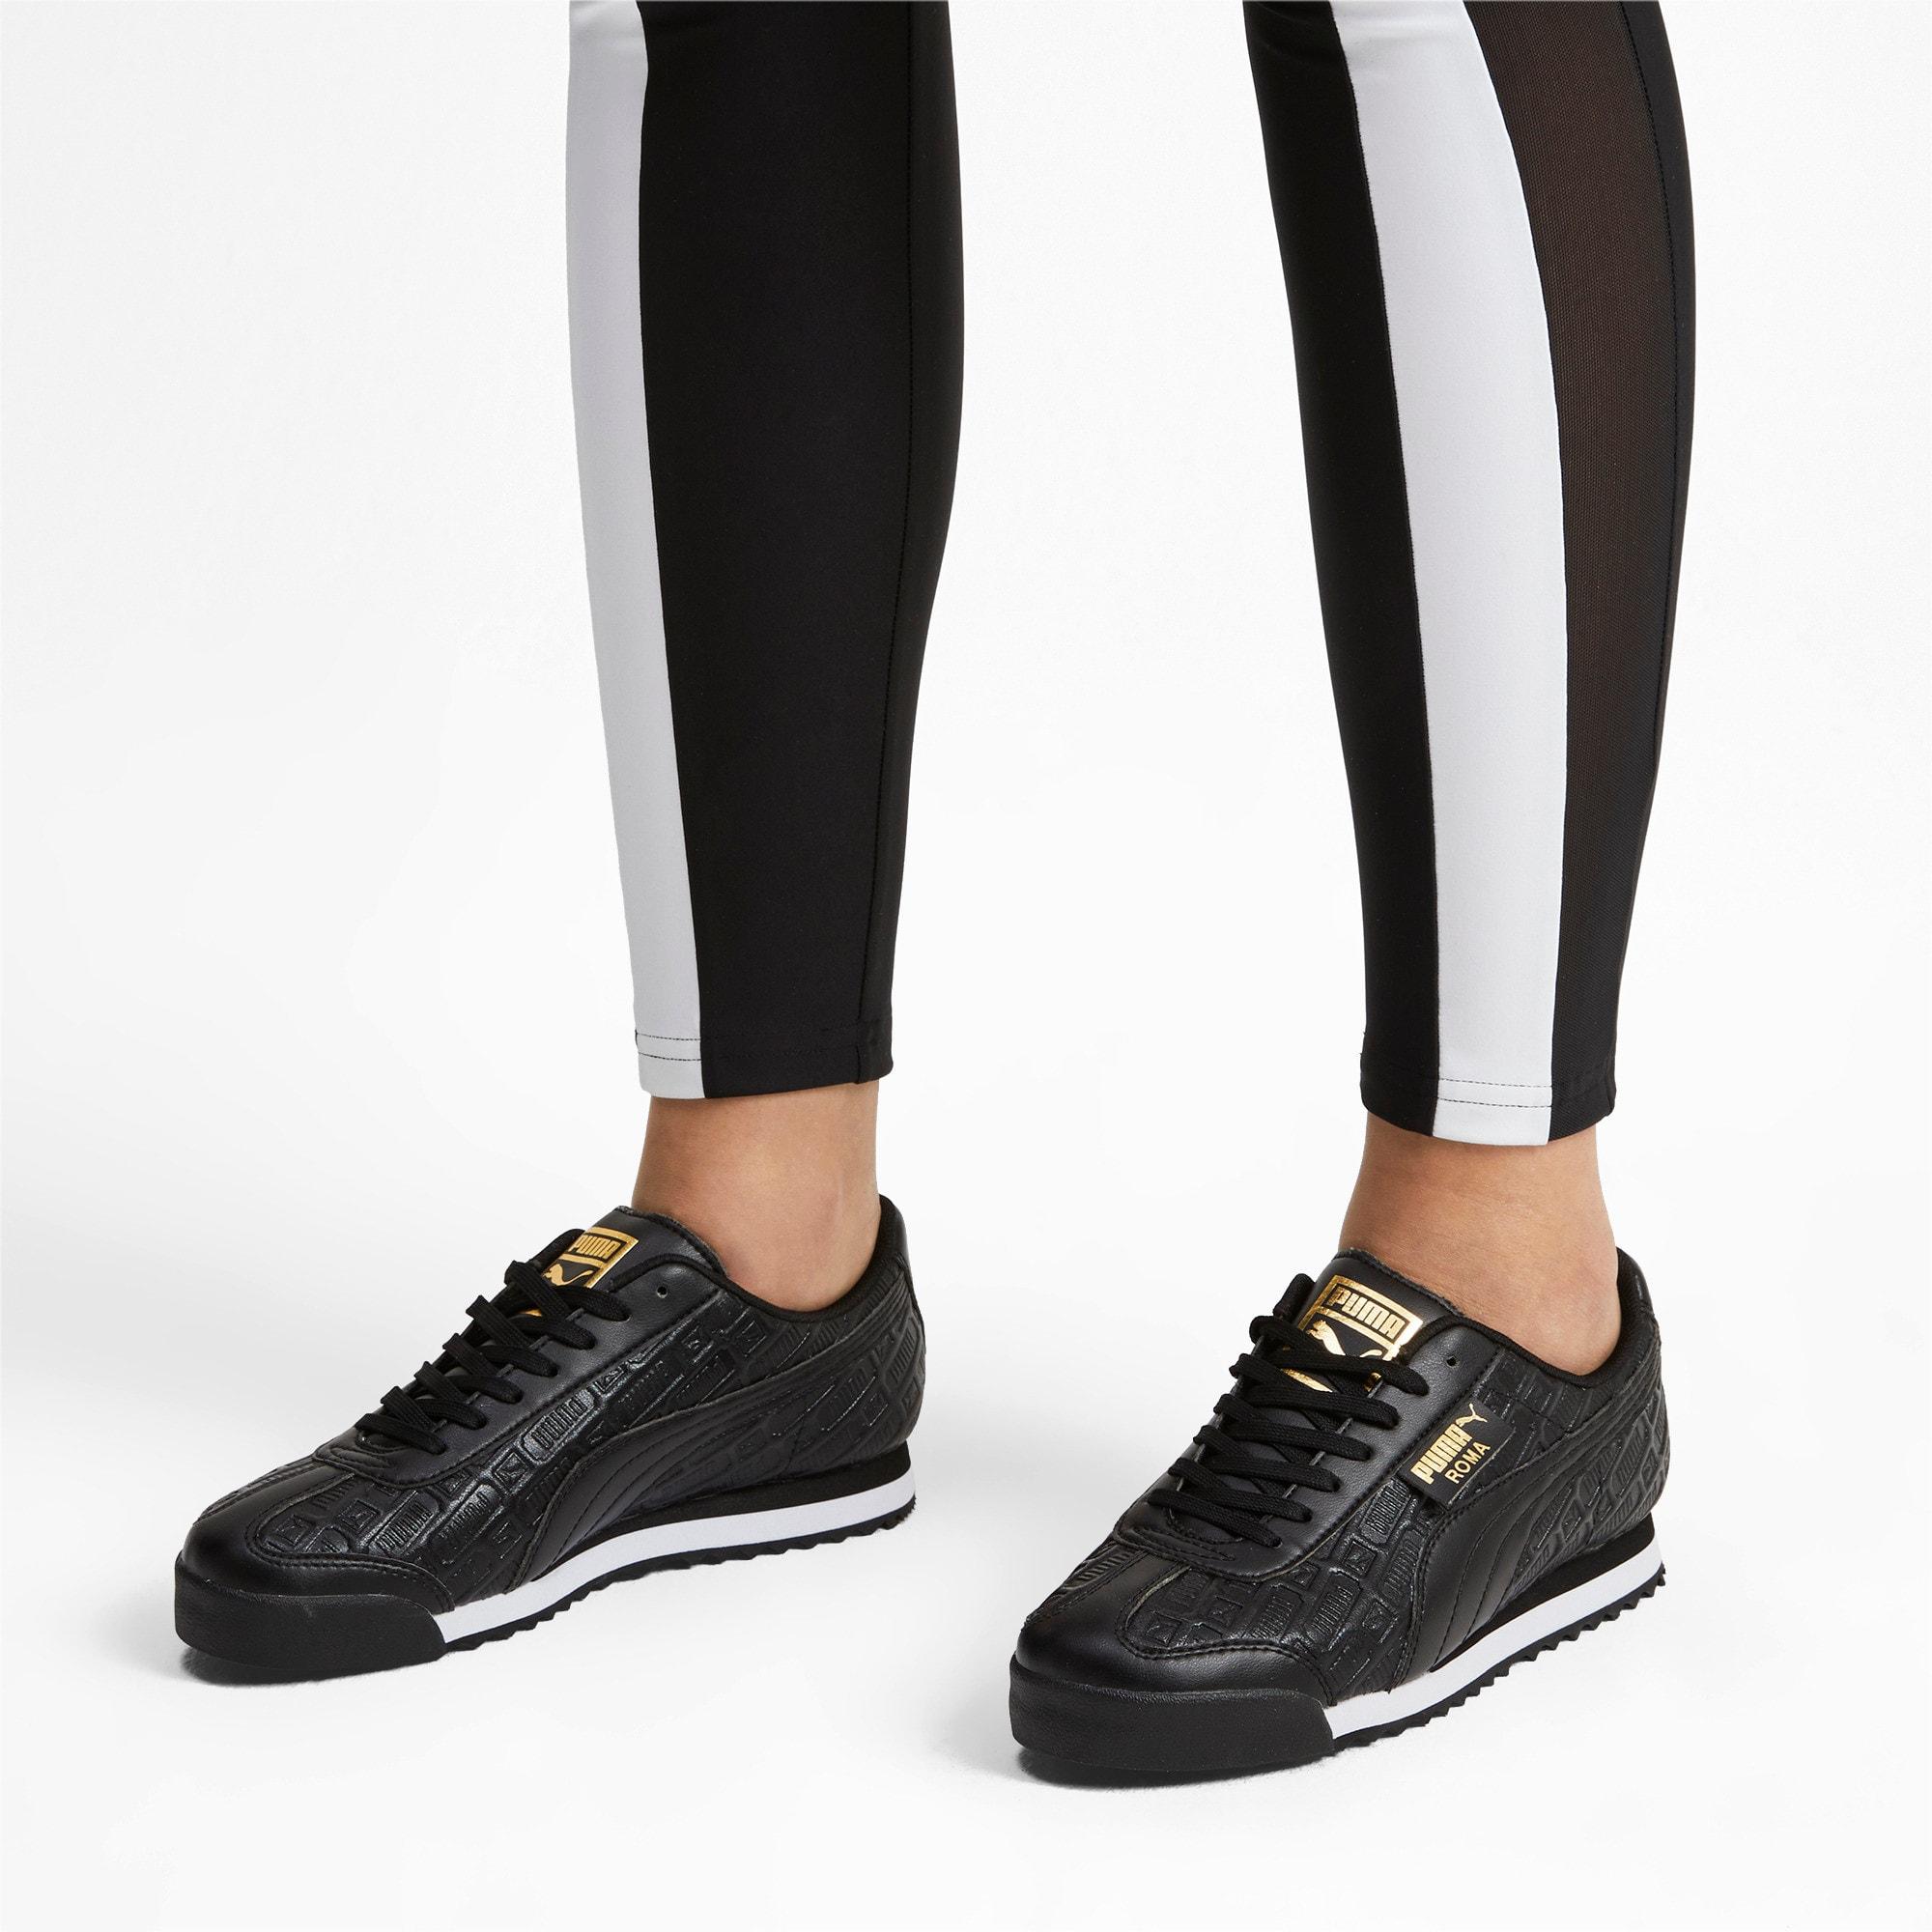 Thumbnail 2 of Roma Reinvent Women's Sneakers, Puma Black-Puma Team Gold, medium